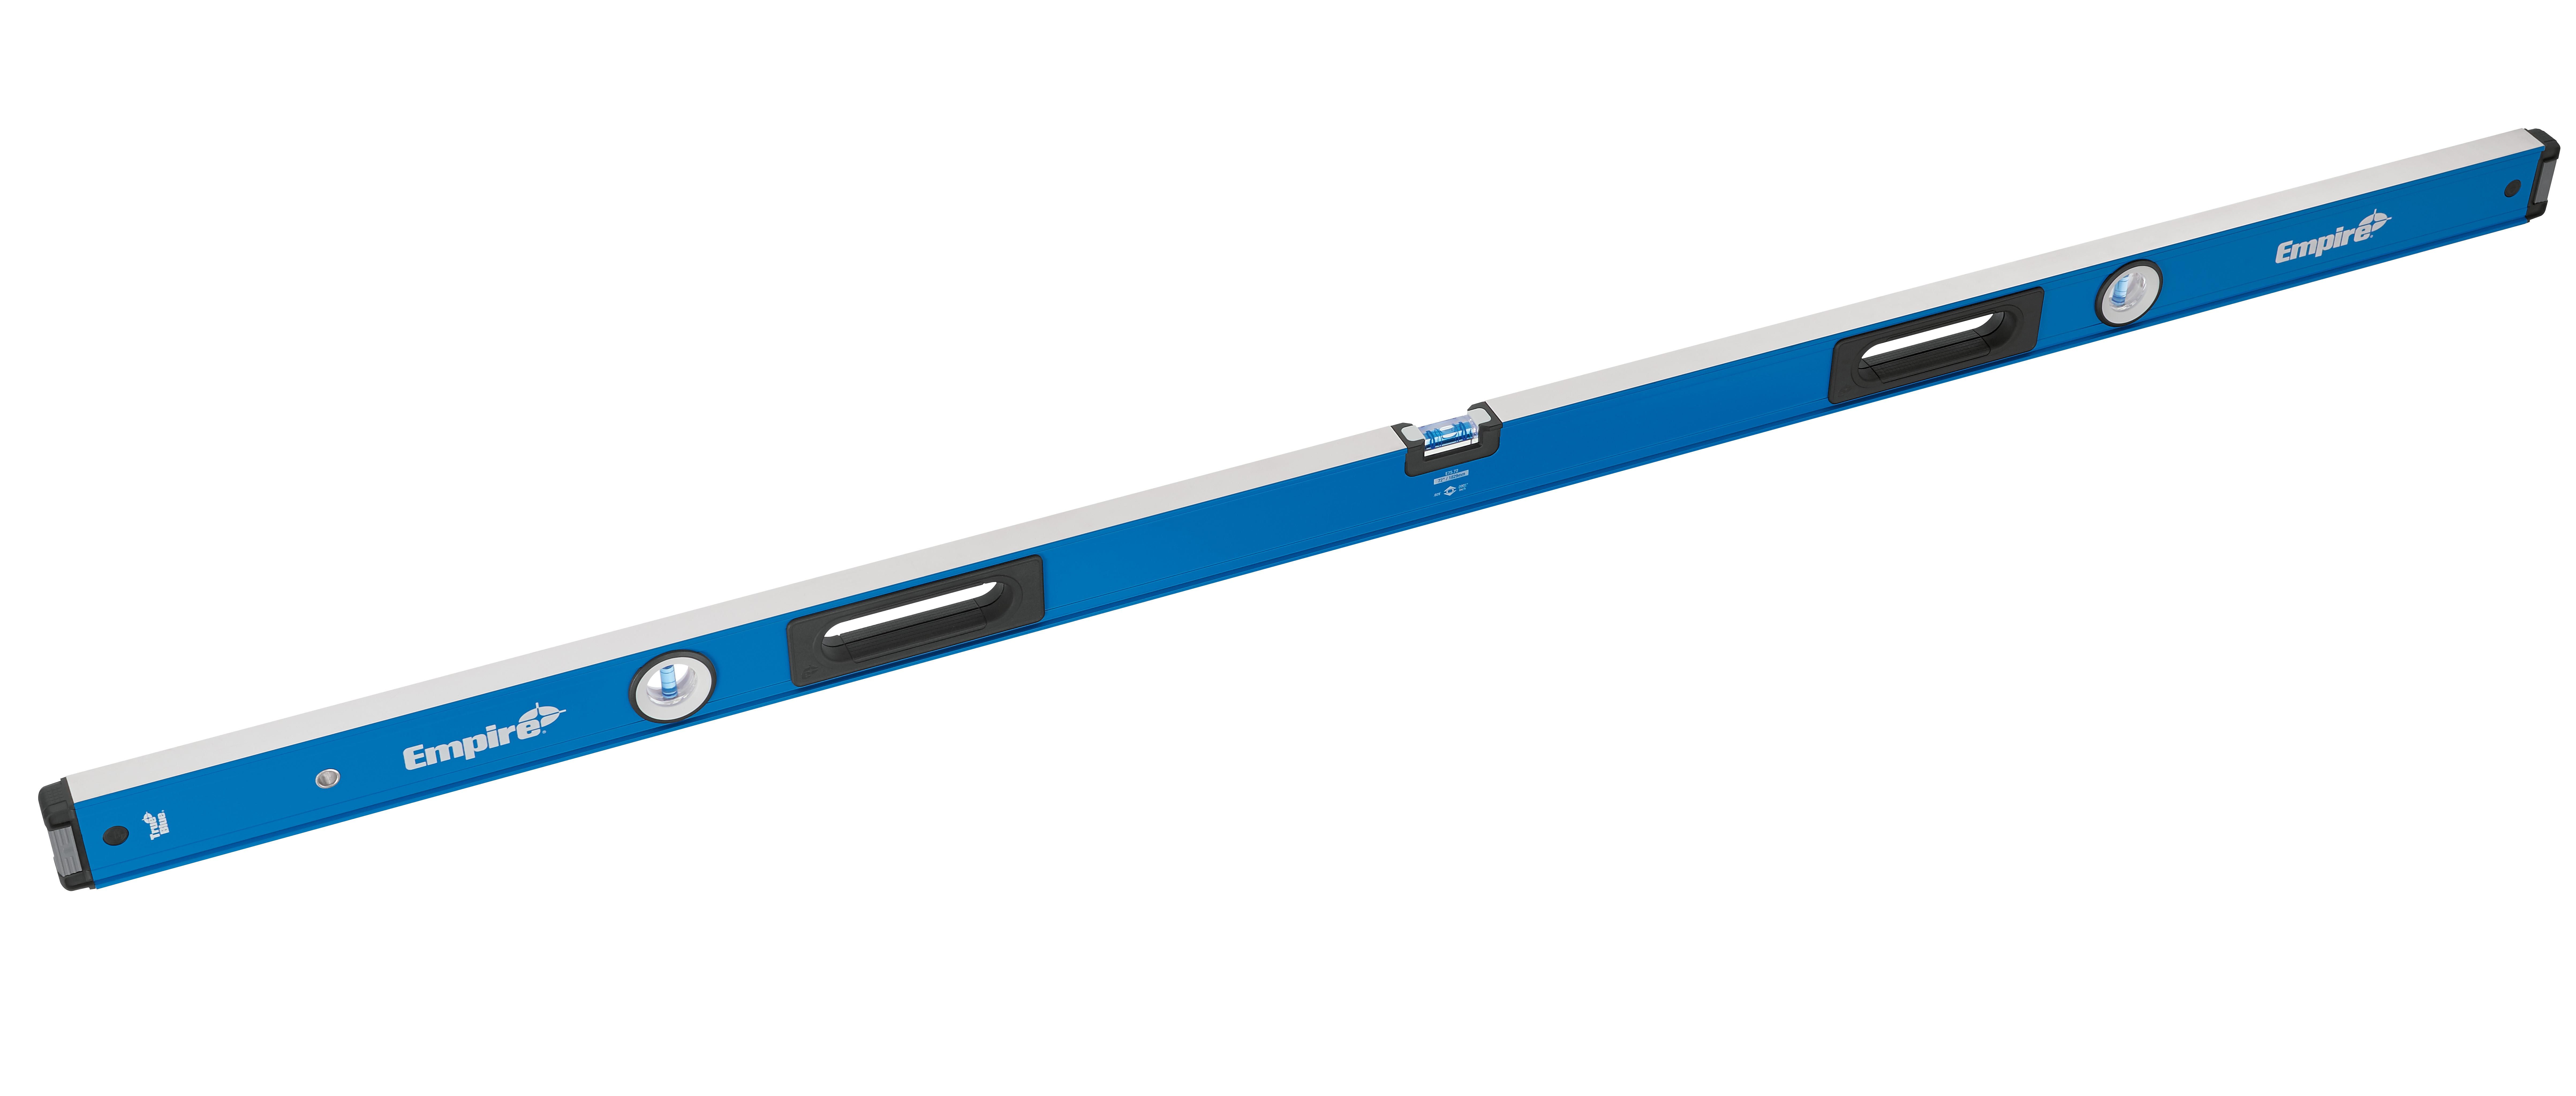 "72"" TRUE BLUE BOX LEVEL"